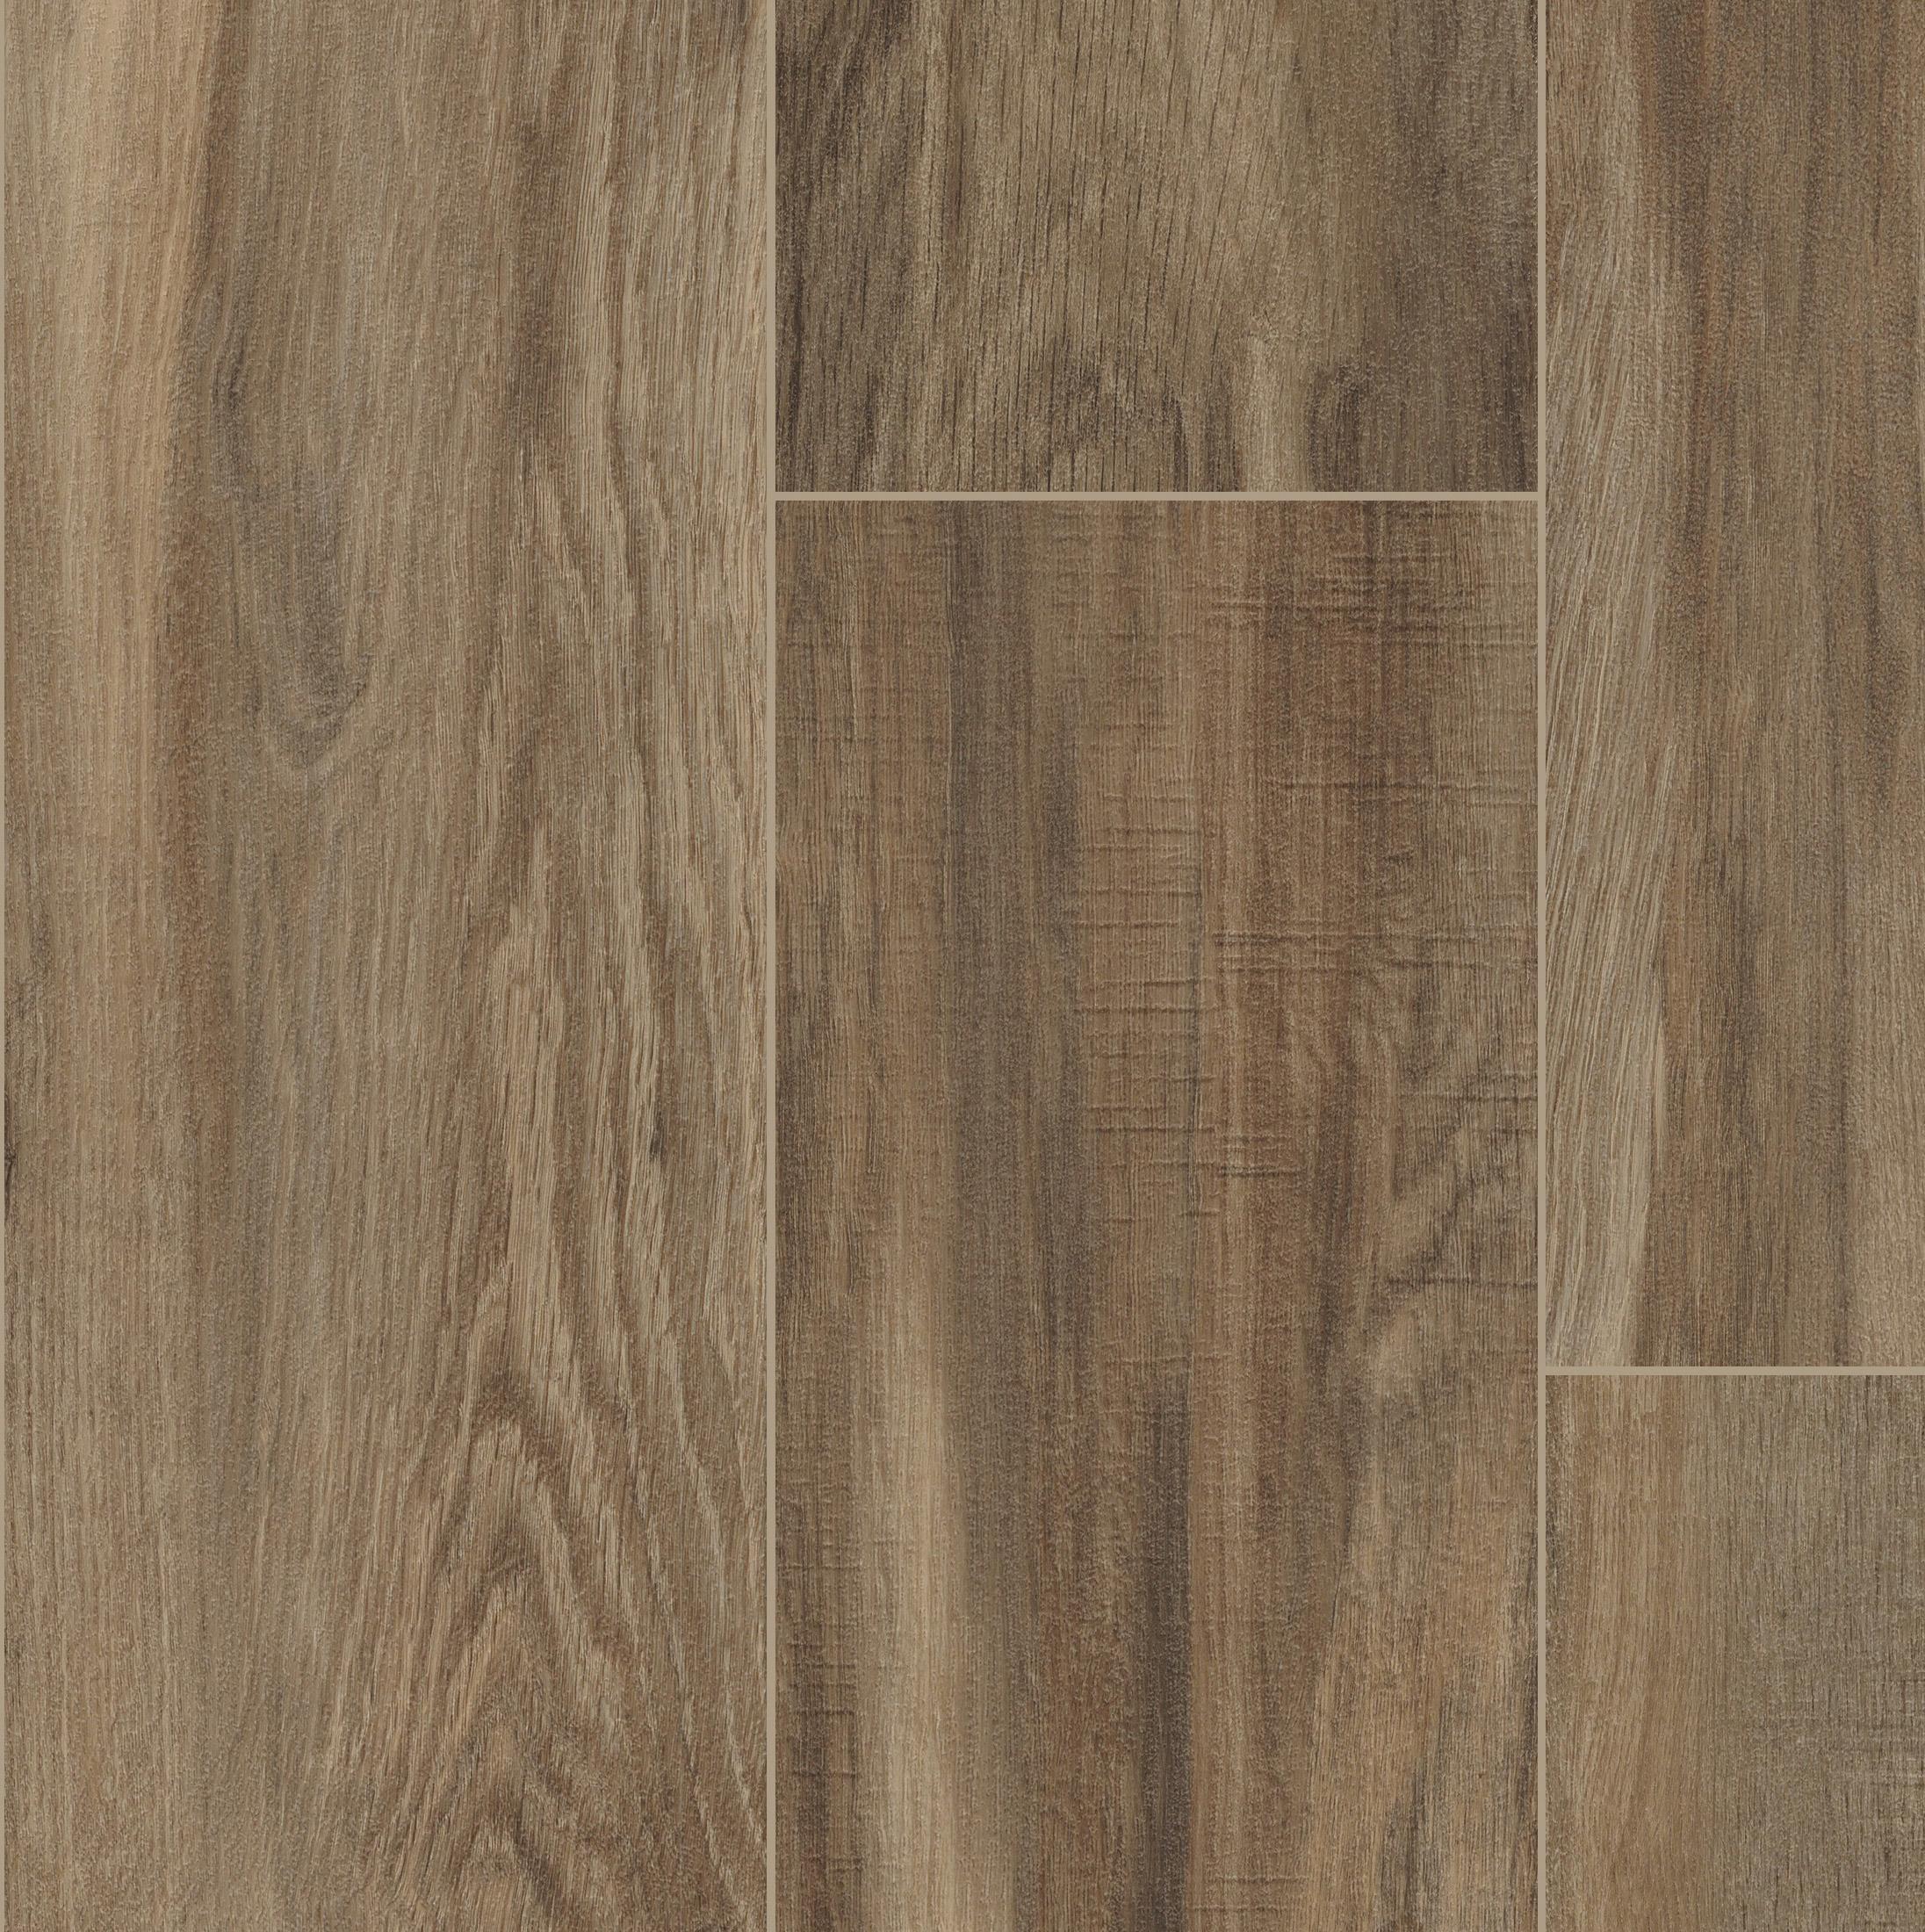 luxury vinyl plank flooring vs engineered hardwood of mohawk amber 9 wide glue down luxury vinyl plank flooring regarding 330 8 78 x 70 55 approved